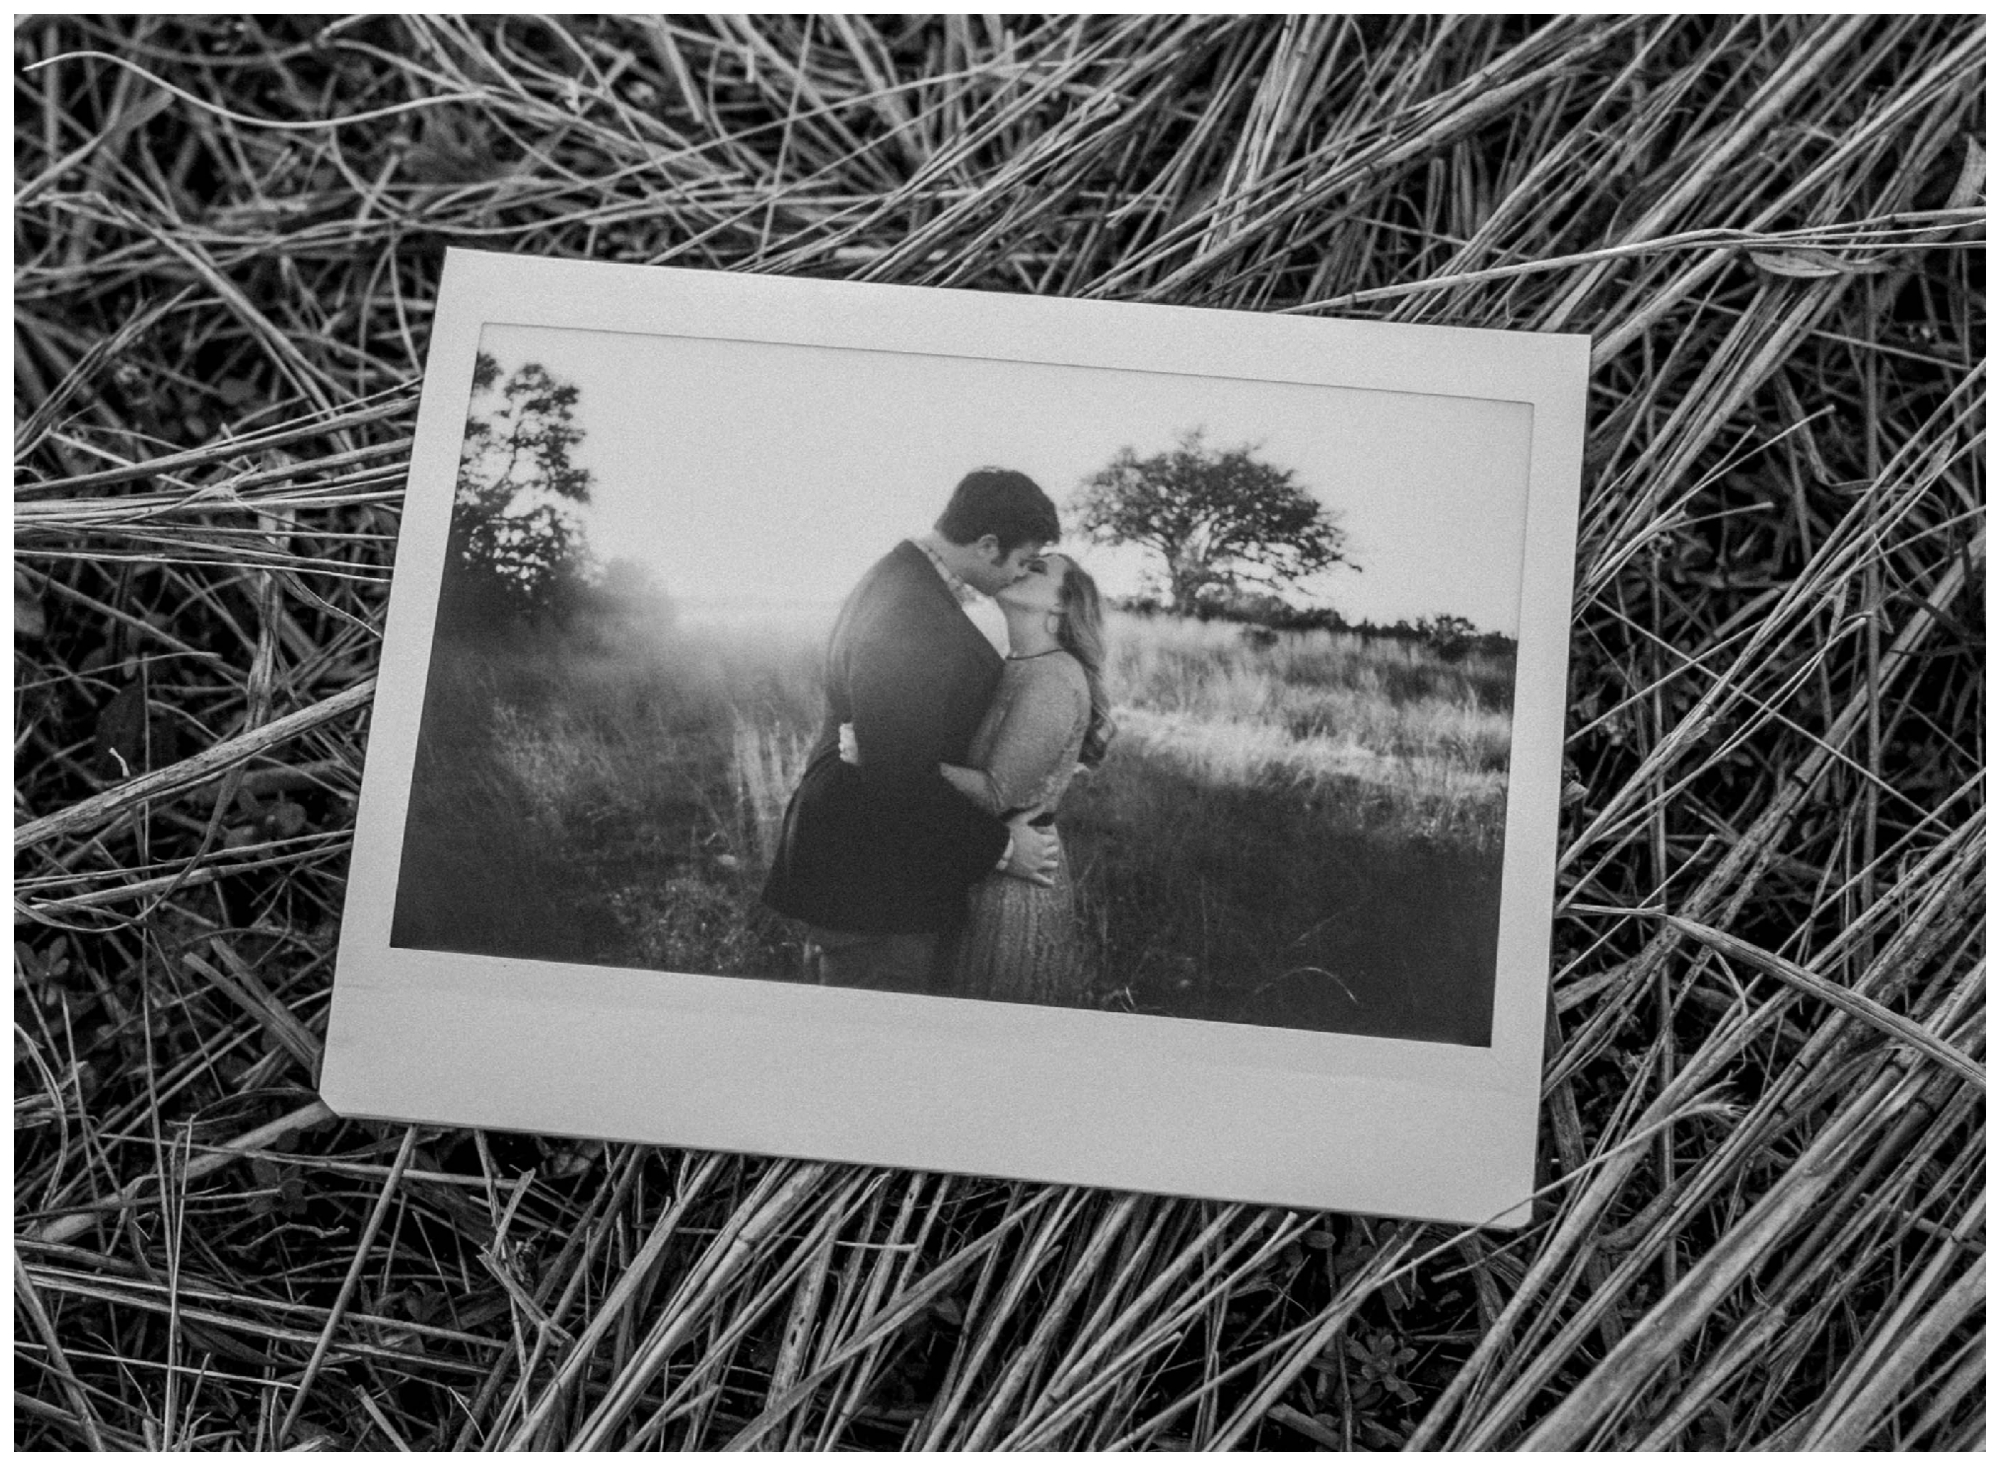 austin-texas-wedding-photography-1778-photographie_0017.jpg